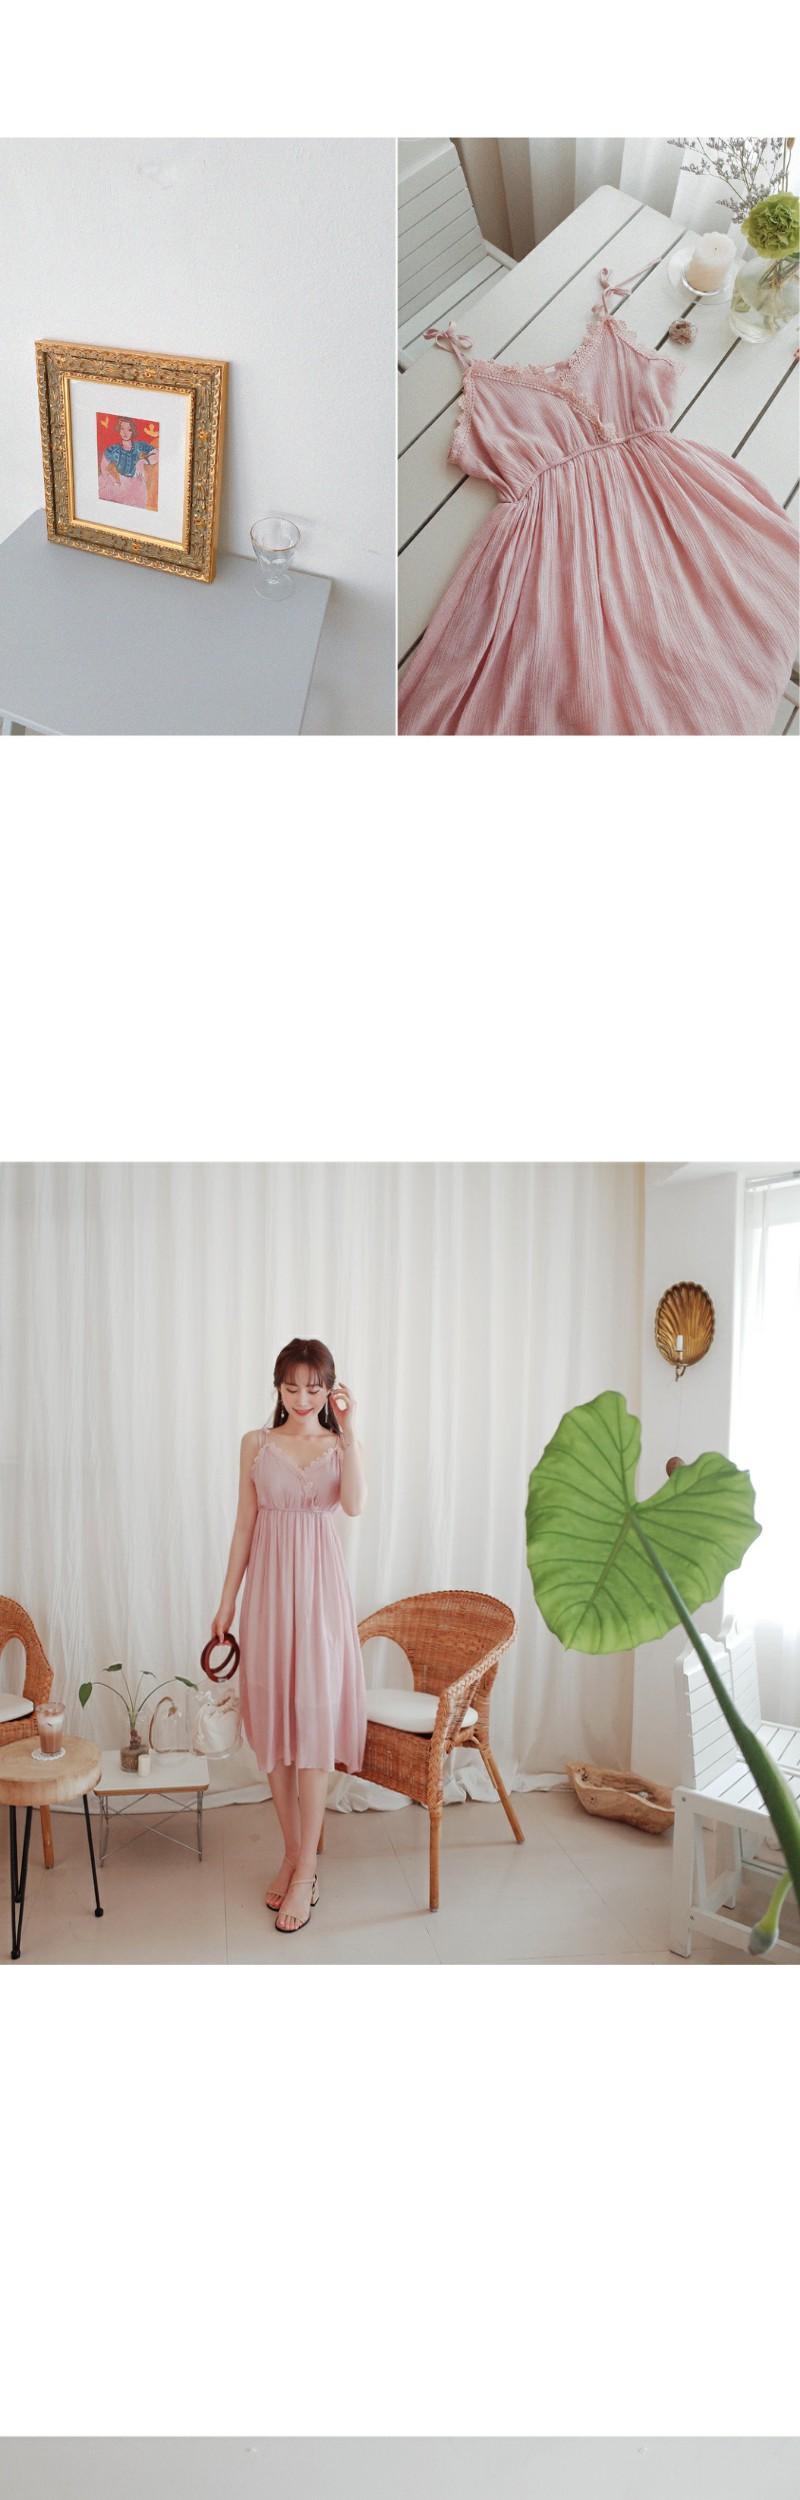 Cheerful lace dress